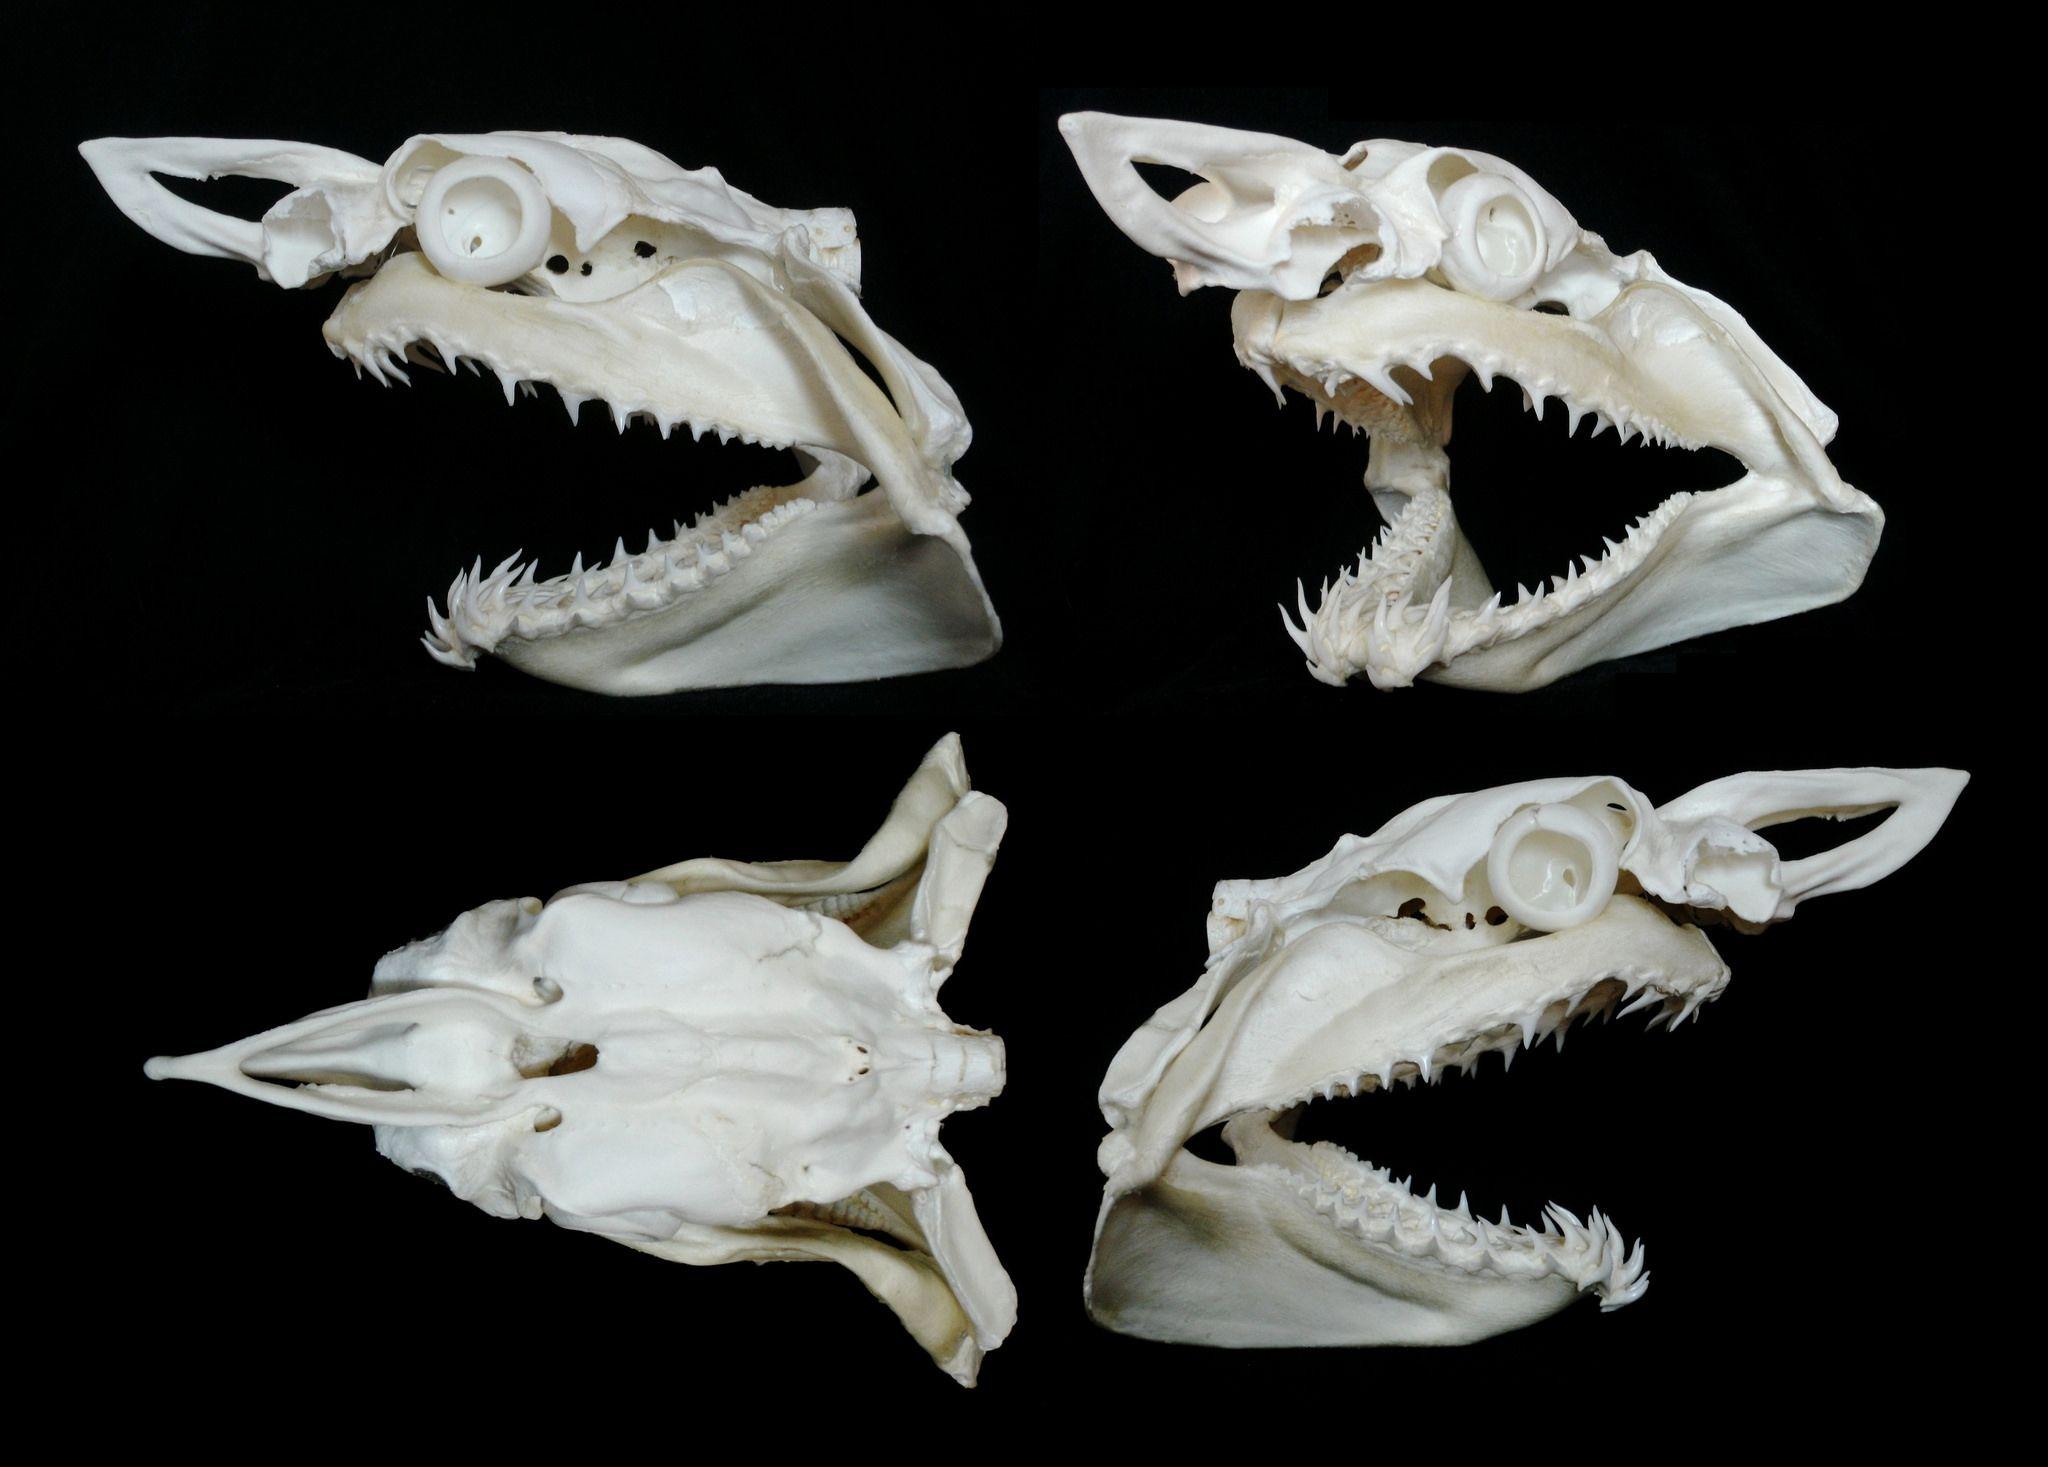 Crâne de Requin Mako / Mako Shark Skull (Isurus oxyrinchus) en 2018 ...